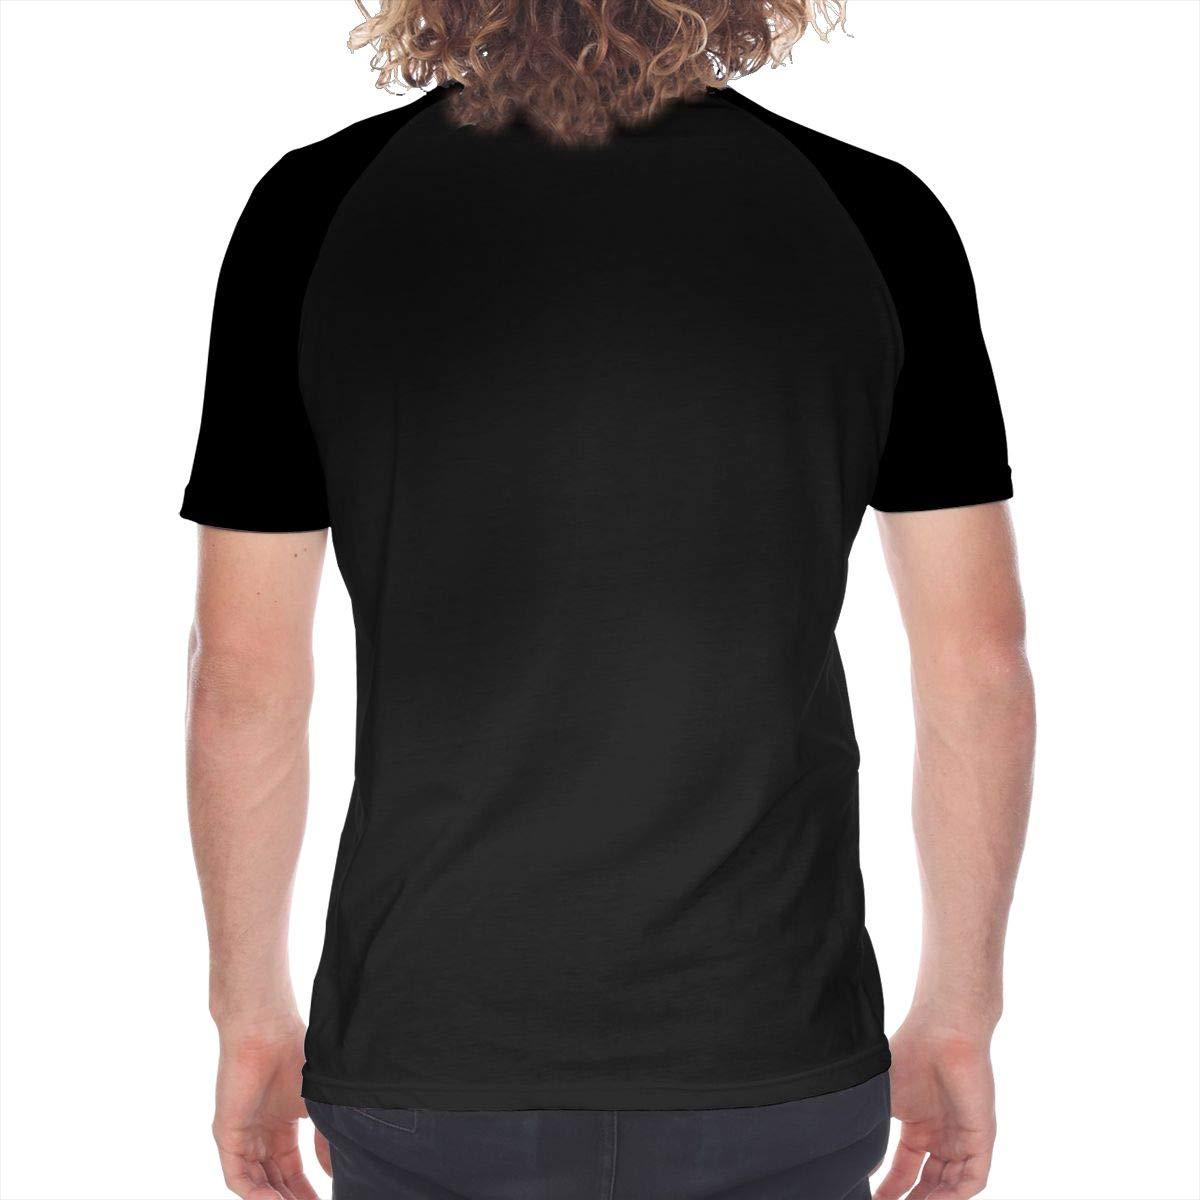 FwadGacx Epica Man Youth Stylish Short Sleeves Full Size Printed Baseball Tee Gift